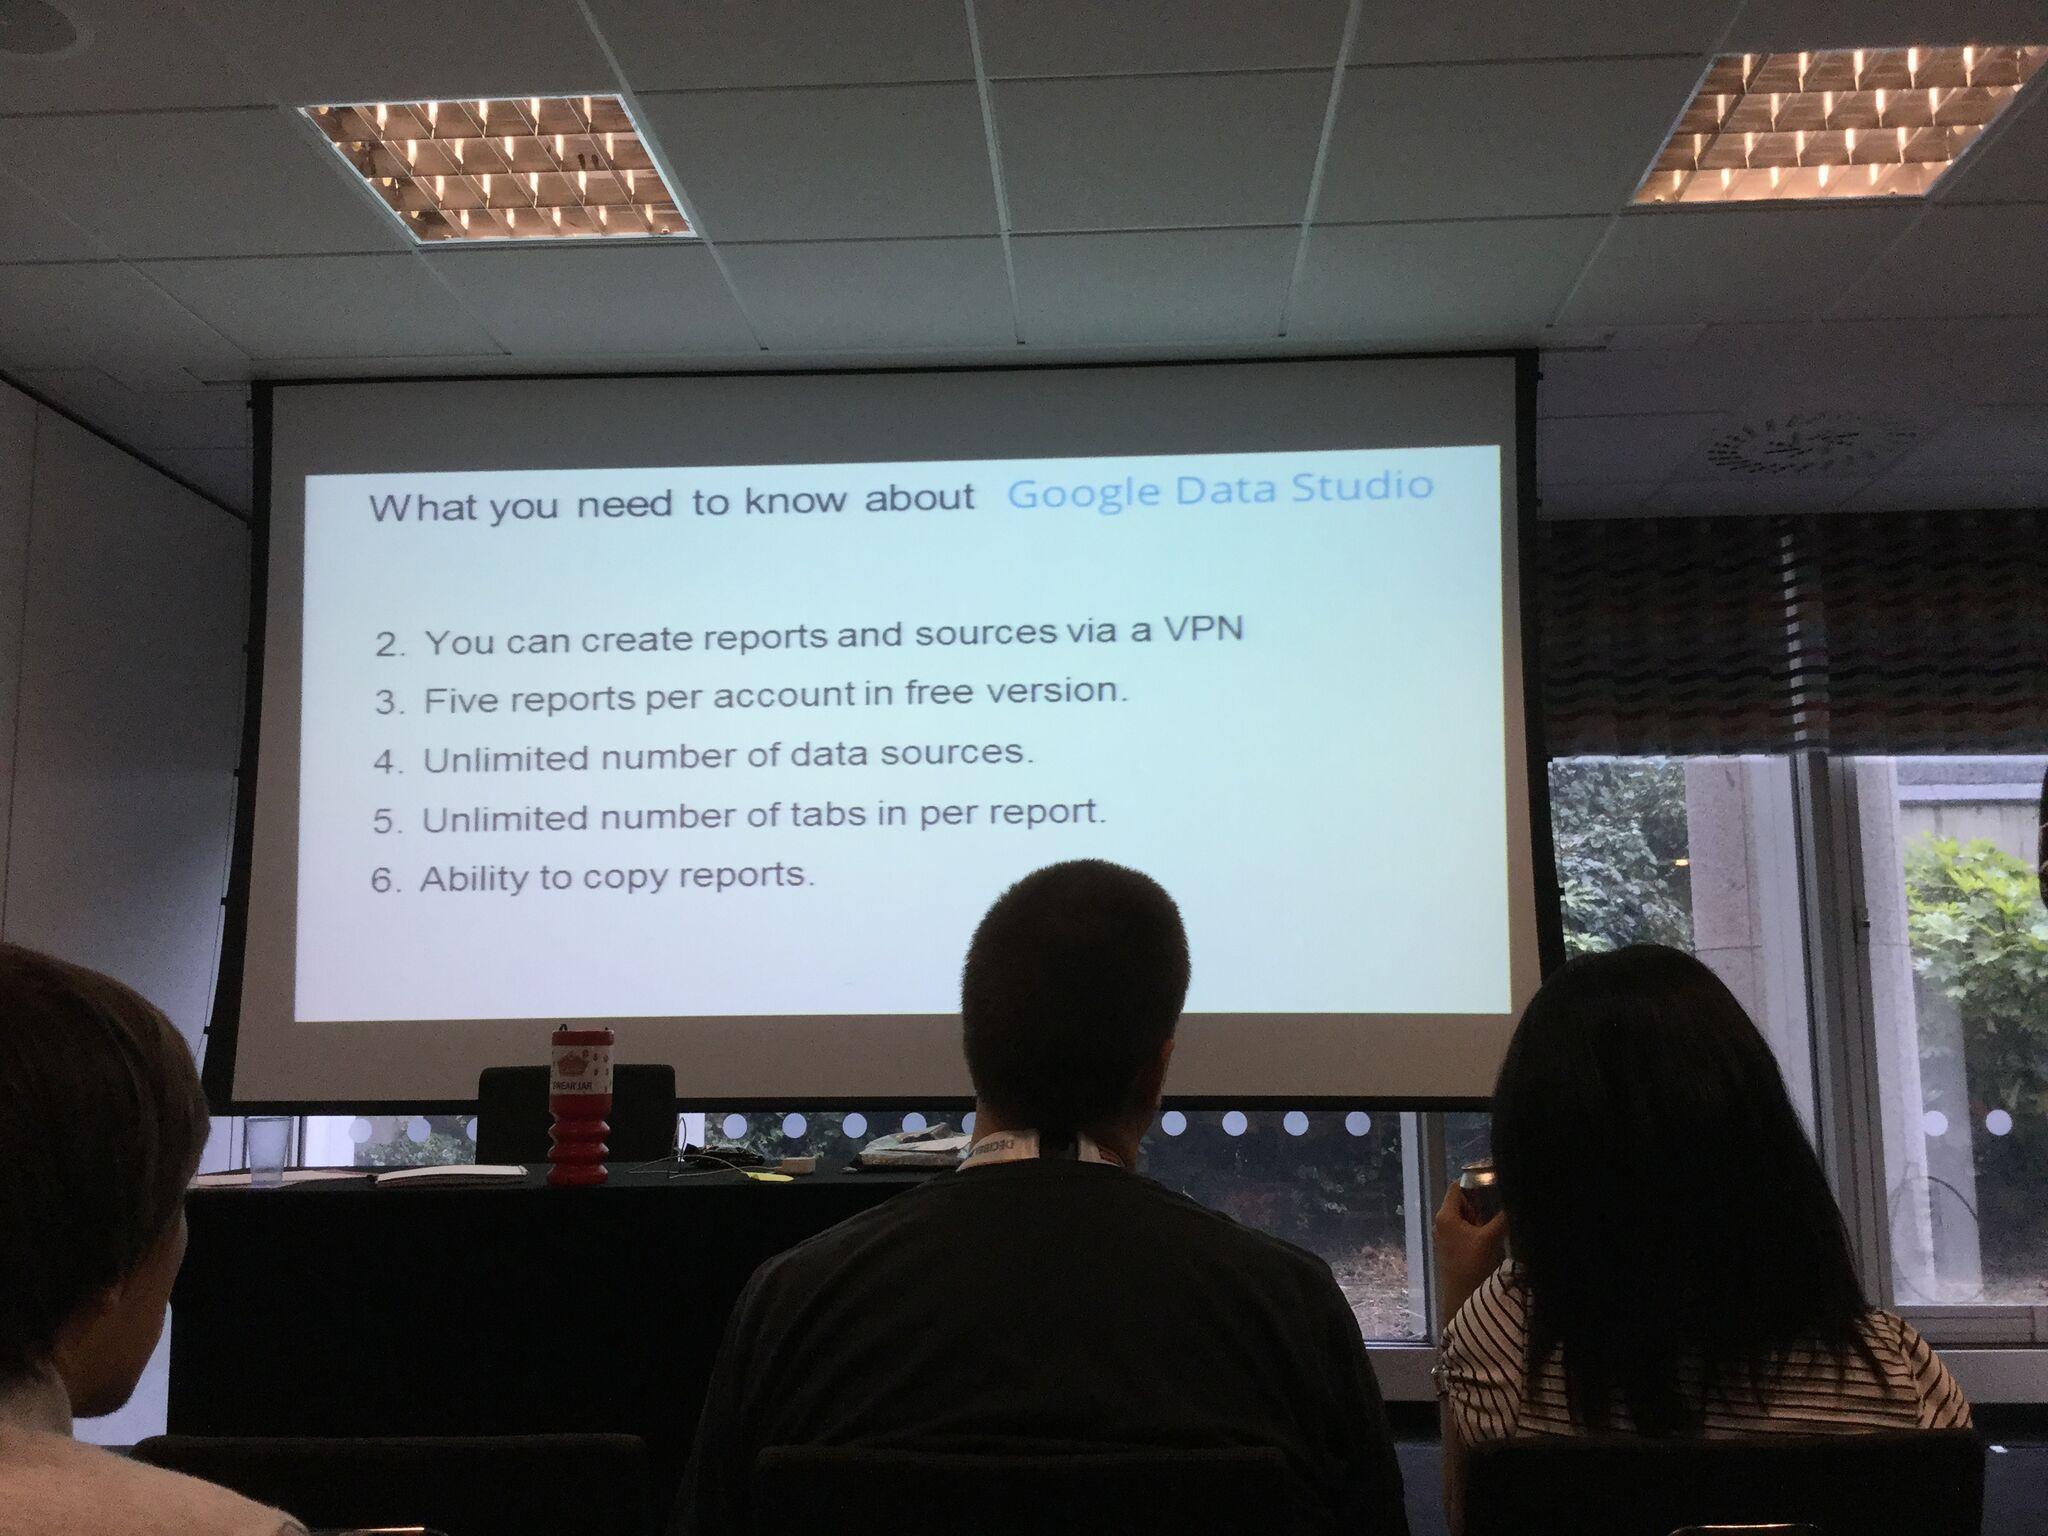 Phil Pearce, Data Studio